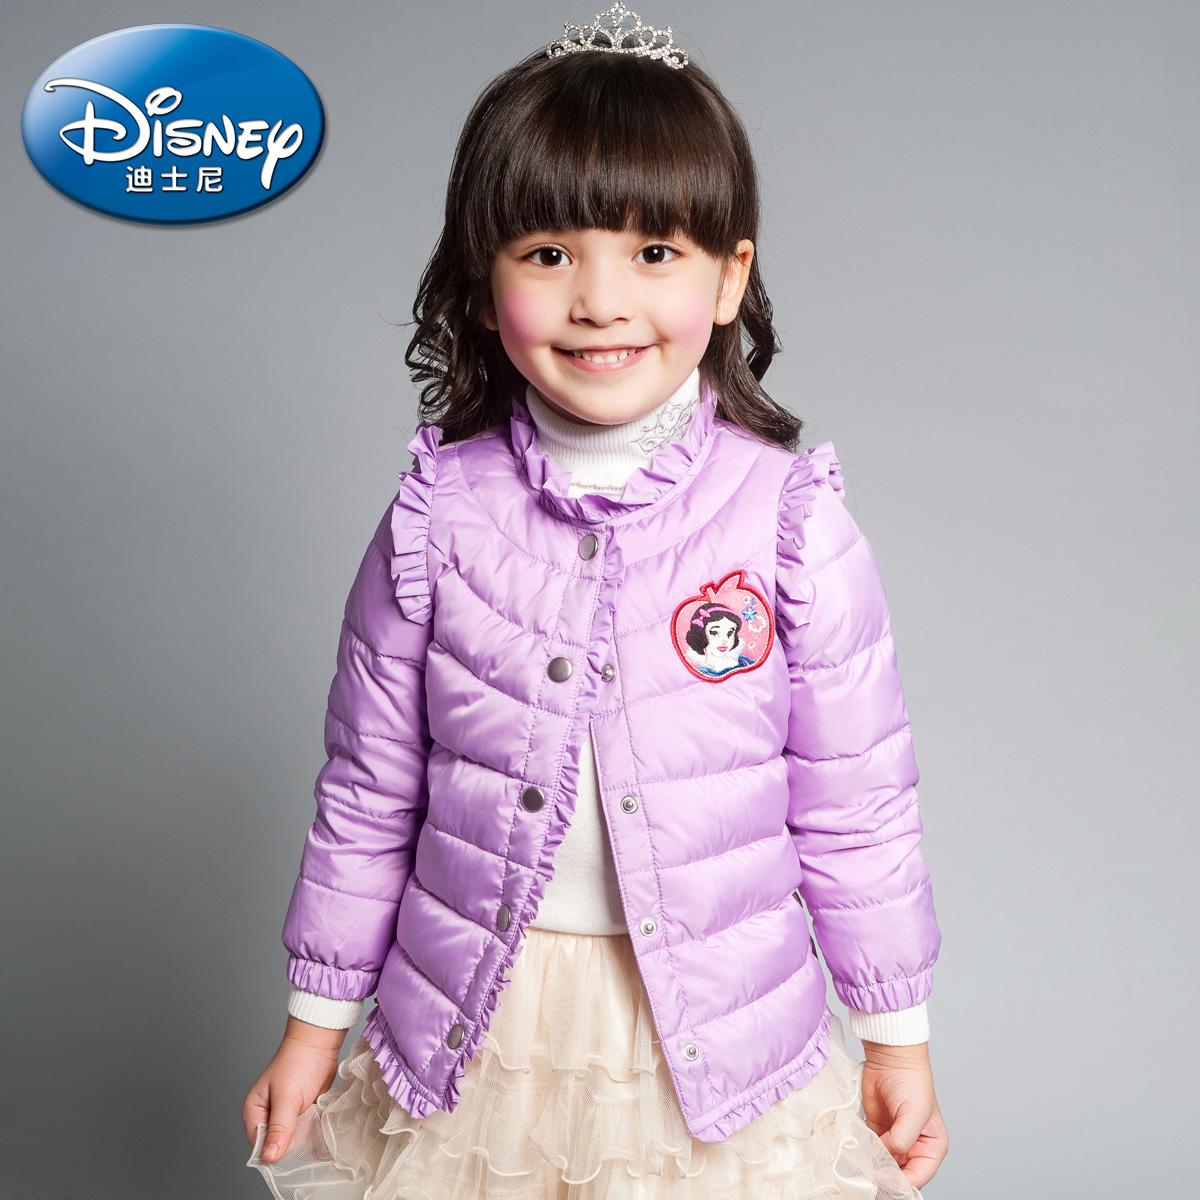 Пуховик детский Disney rd312002 2013 Disney